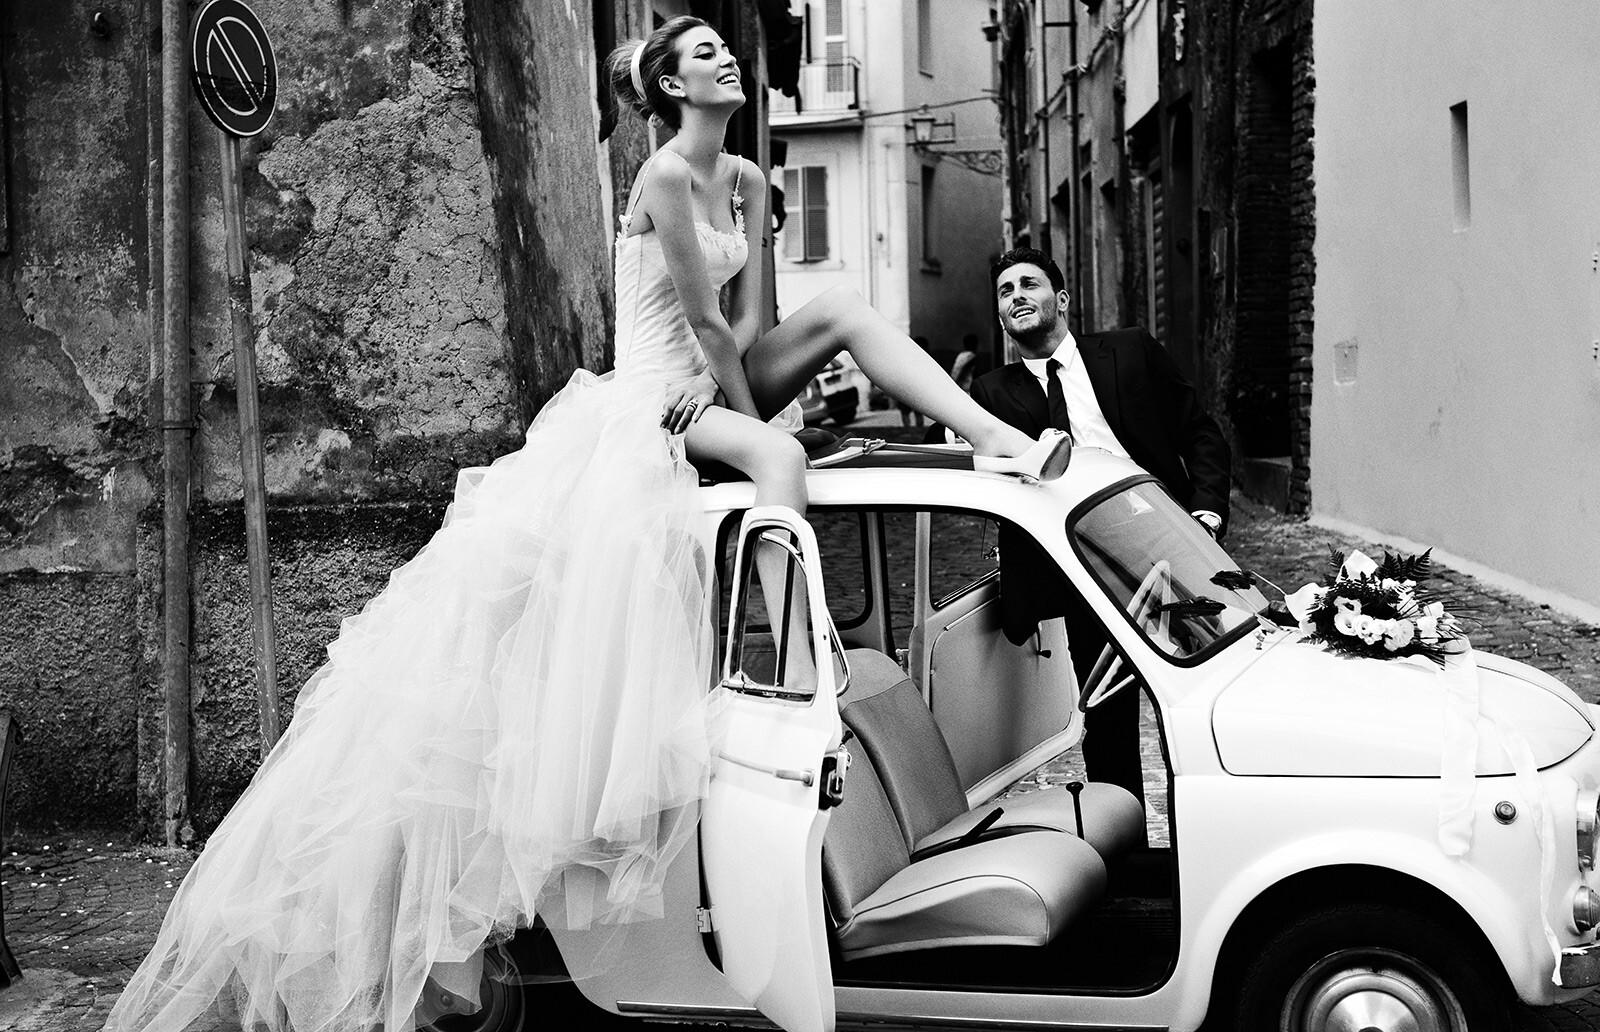 Italian Wedding II - David Burton | Trunk Archive